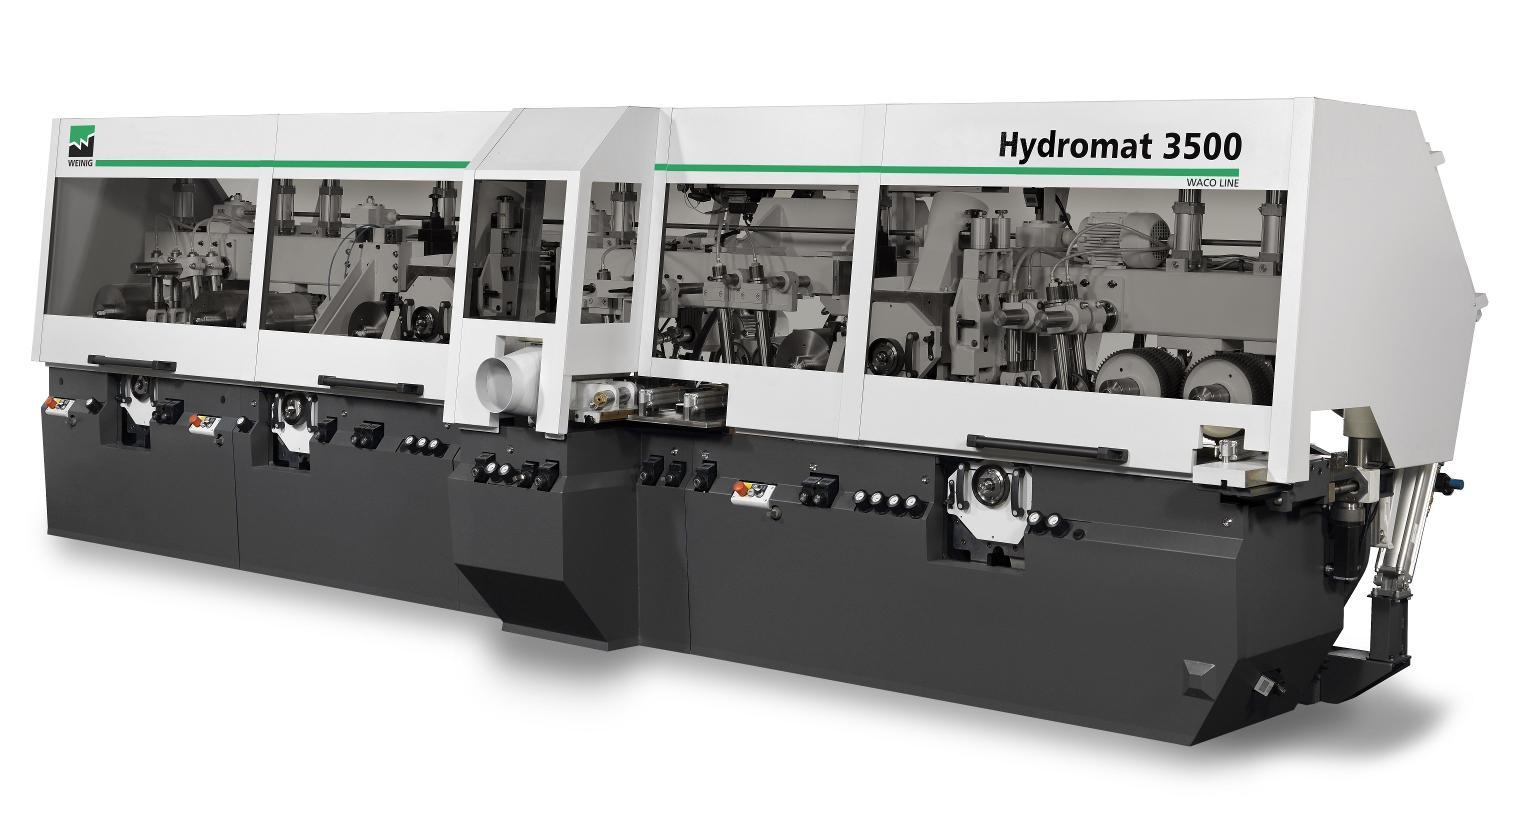 HYDROMAT 3500